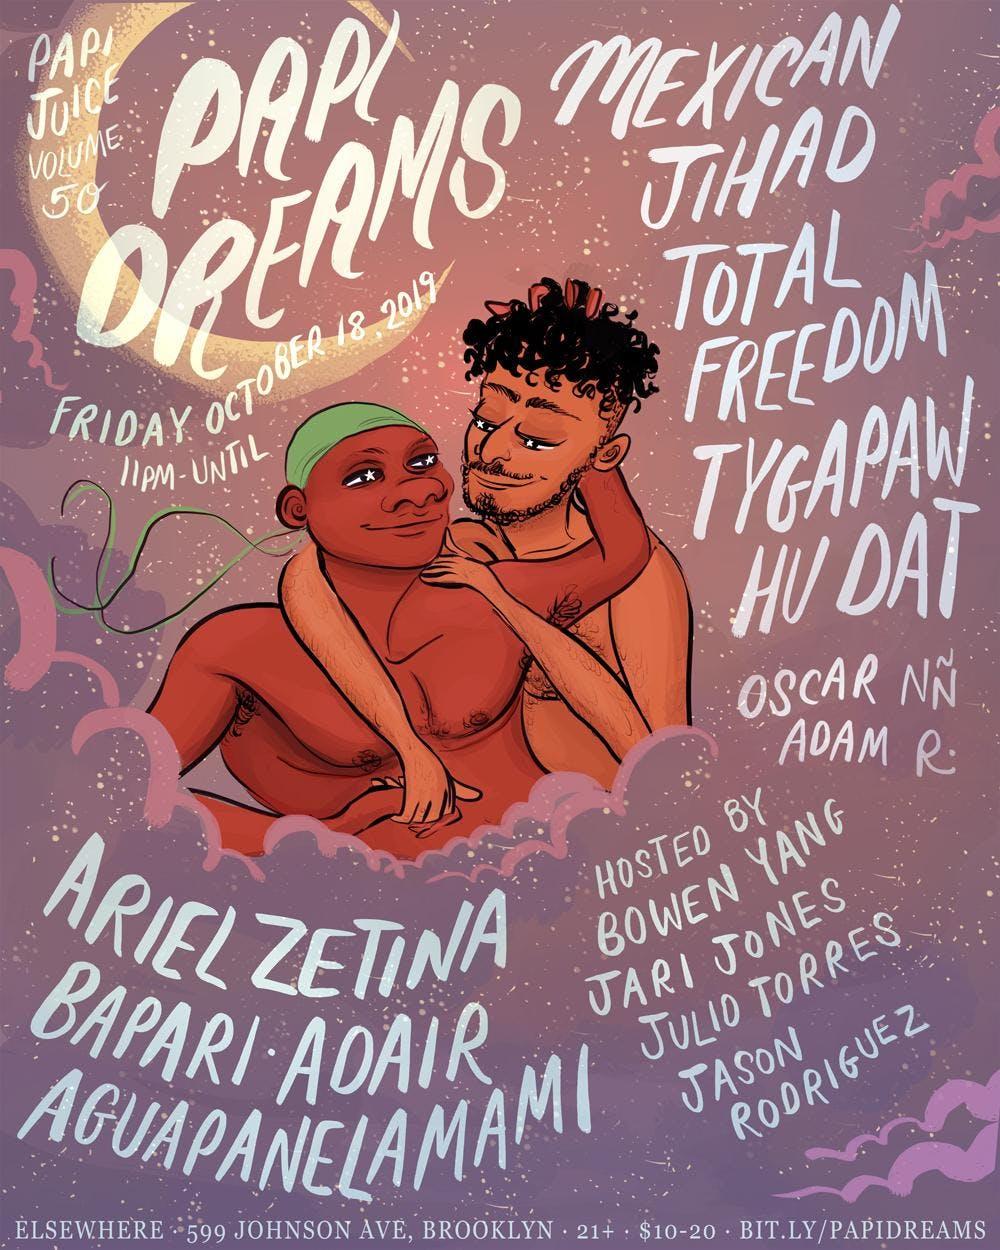 Papi Juice Vol. 50: Papi Dreams w/ Mexican Jihad, Total Freedom, Tygapaw, Hu Dat & More